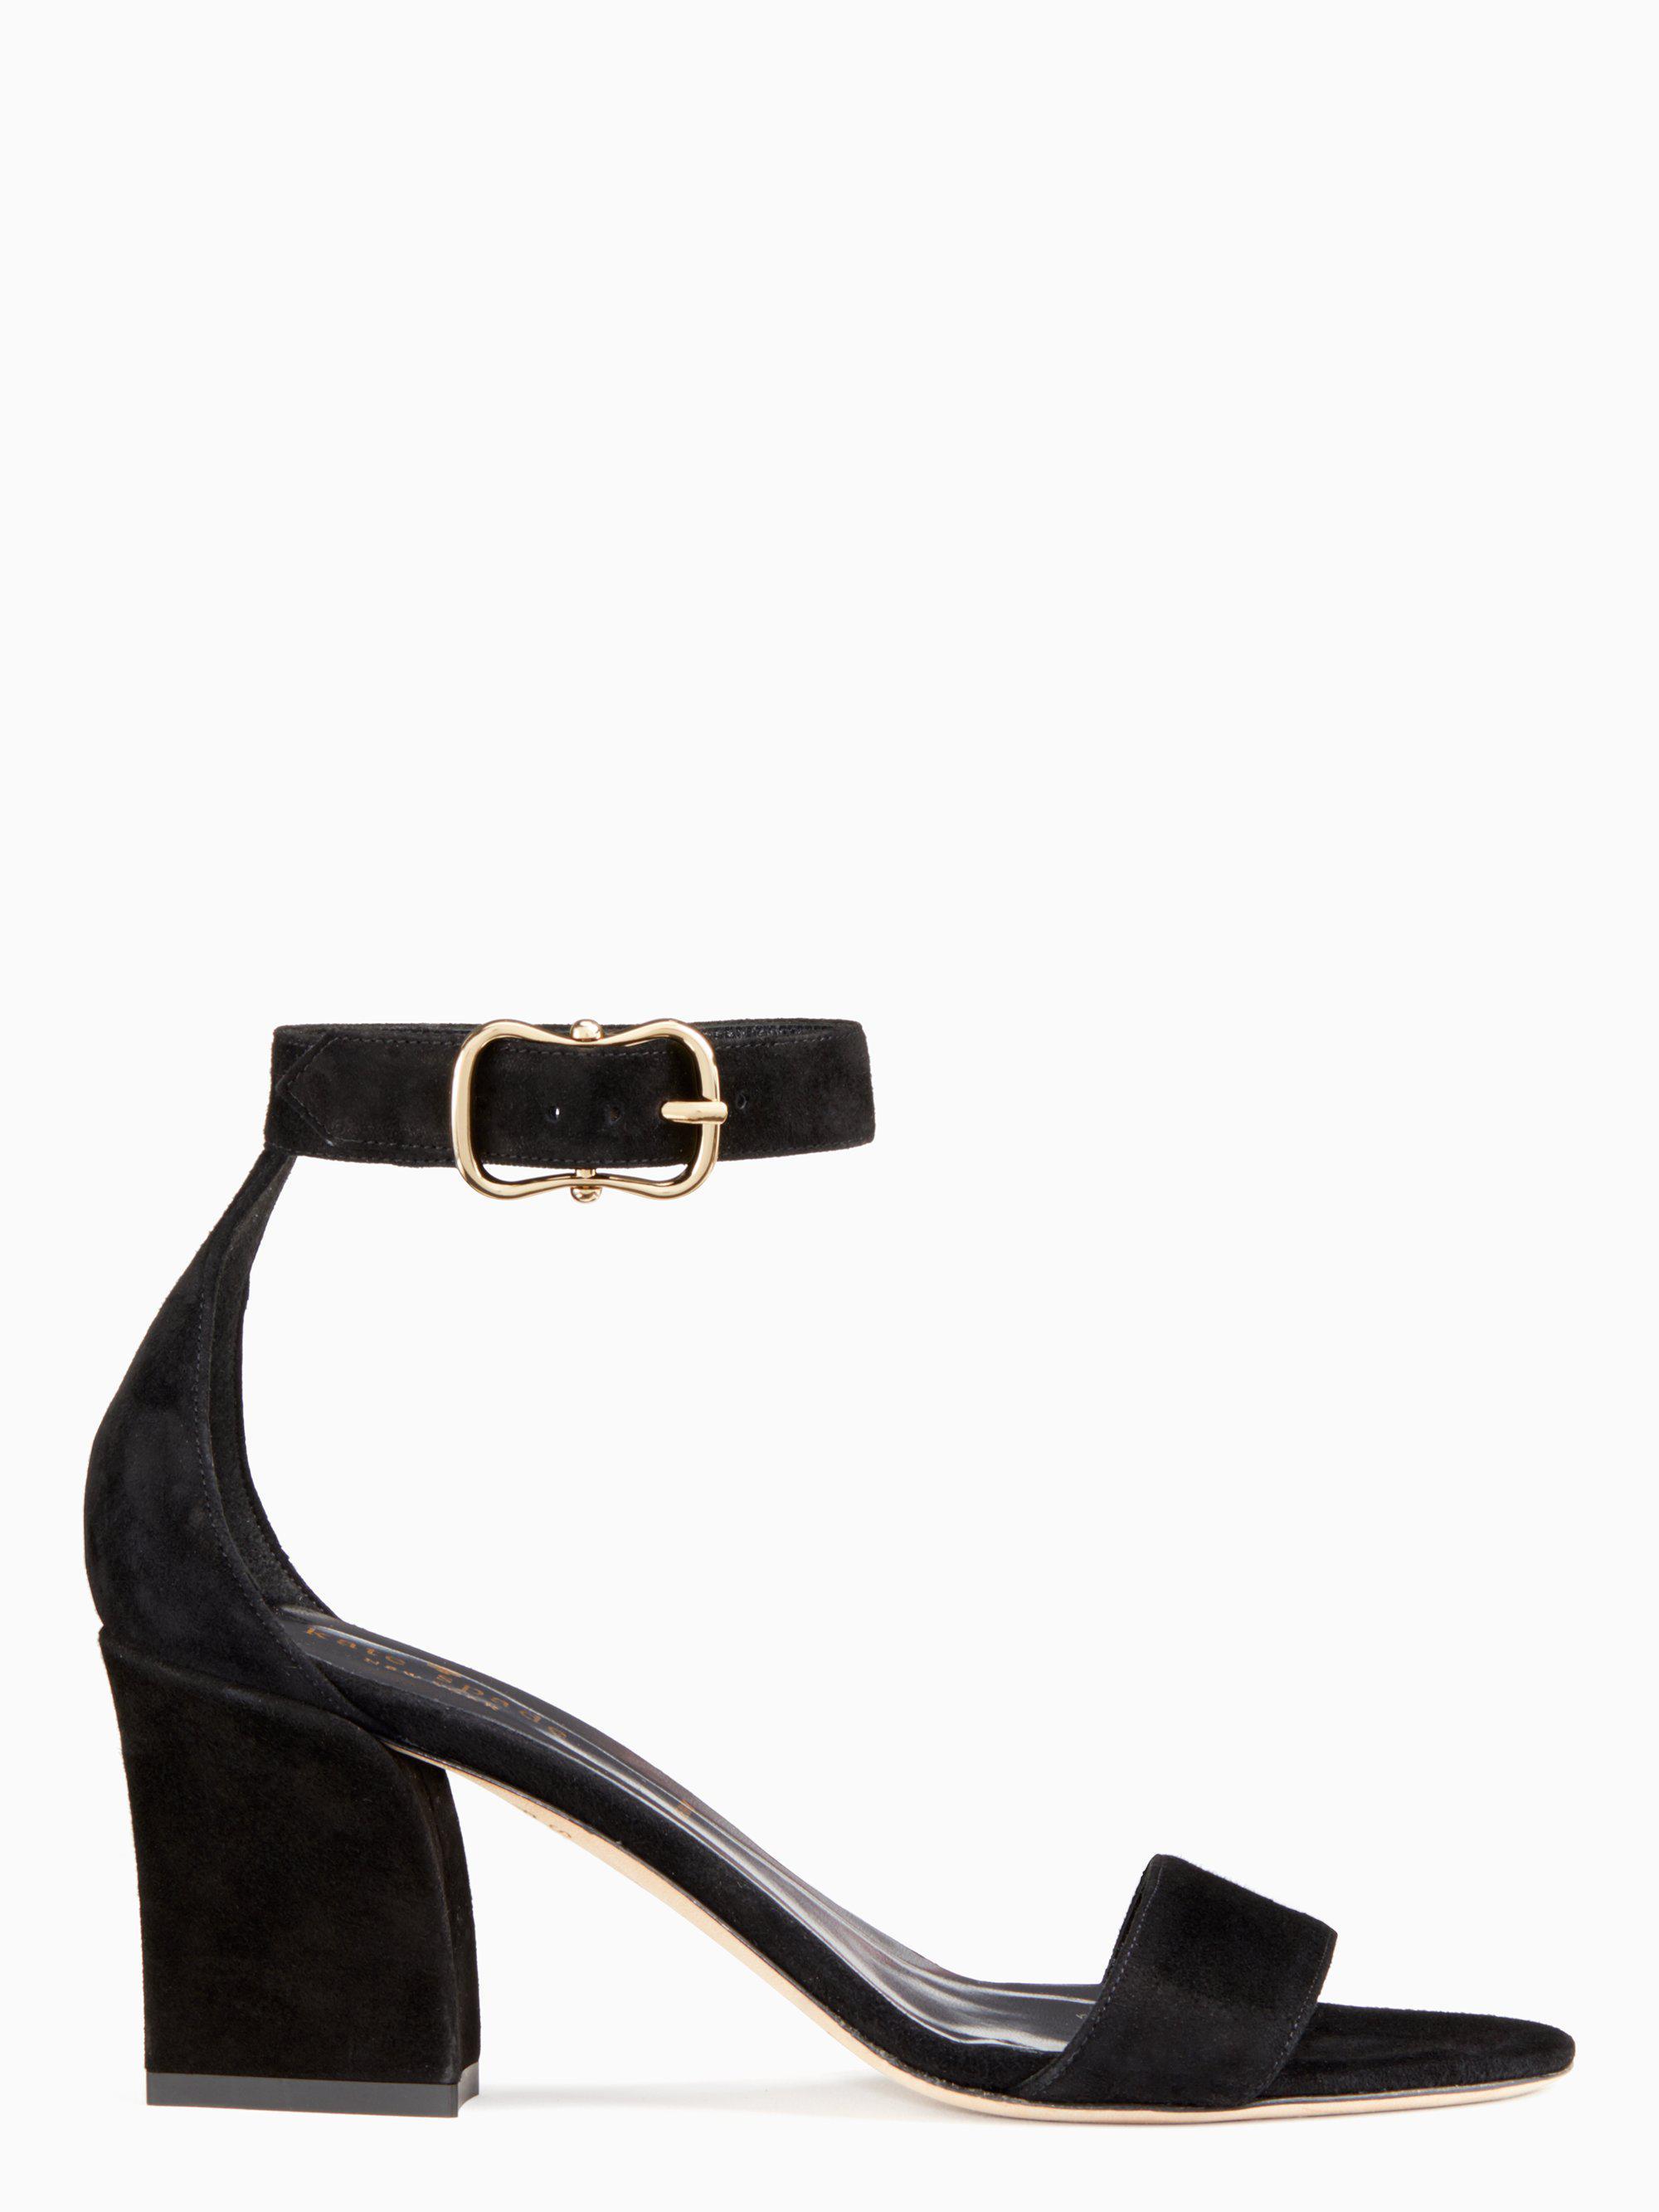 12e7767f0b333a Lyst - Kate Spade Susane Heels in Black - Save 20%